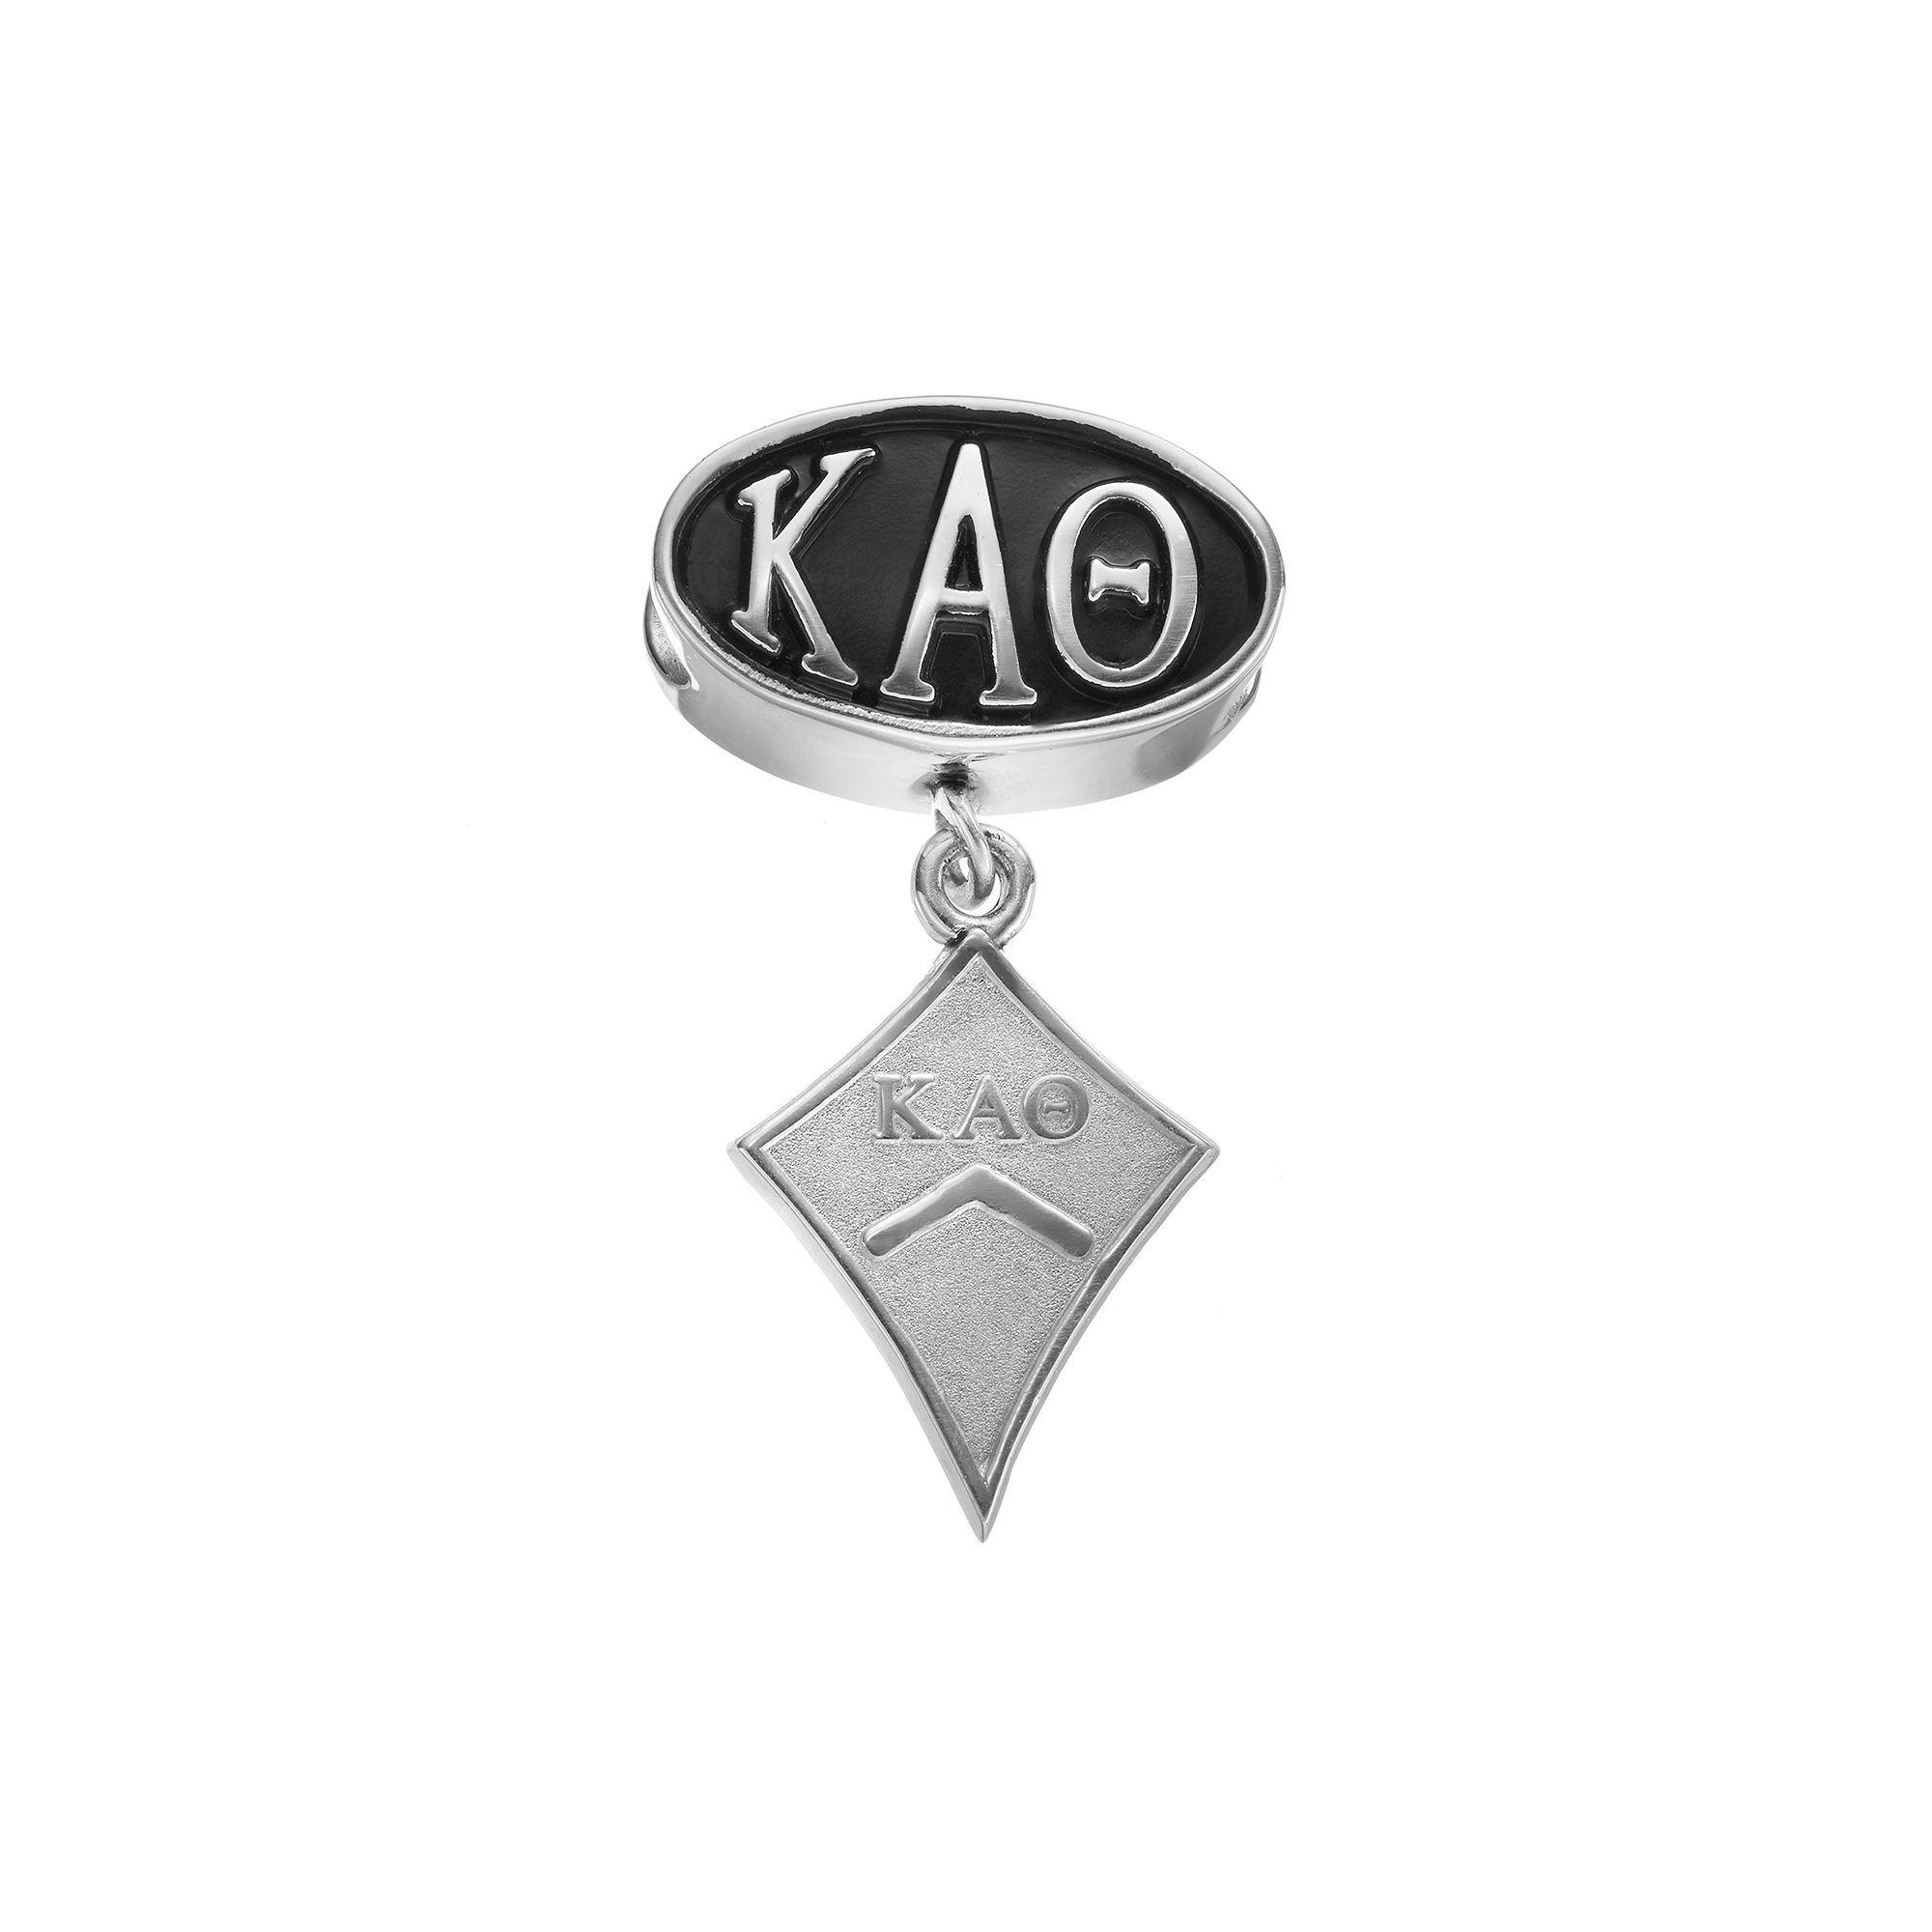 Alpha beta theta symbols image collections symbol and sign ideas logoart kappa alpha theta sterling silver sorority symbol charm logoart kappa alpha theta sterling silver sorority biocorpaavc Images